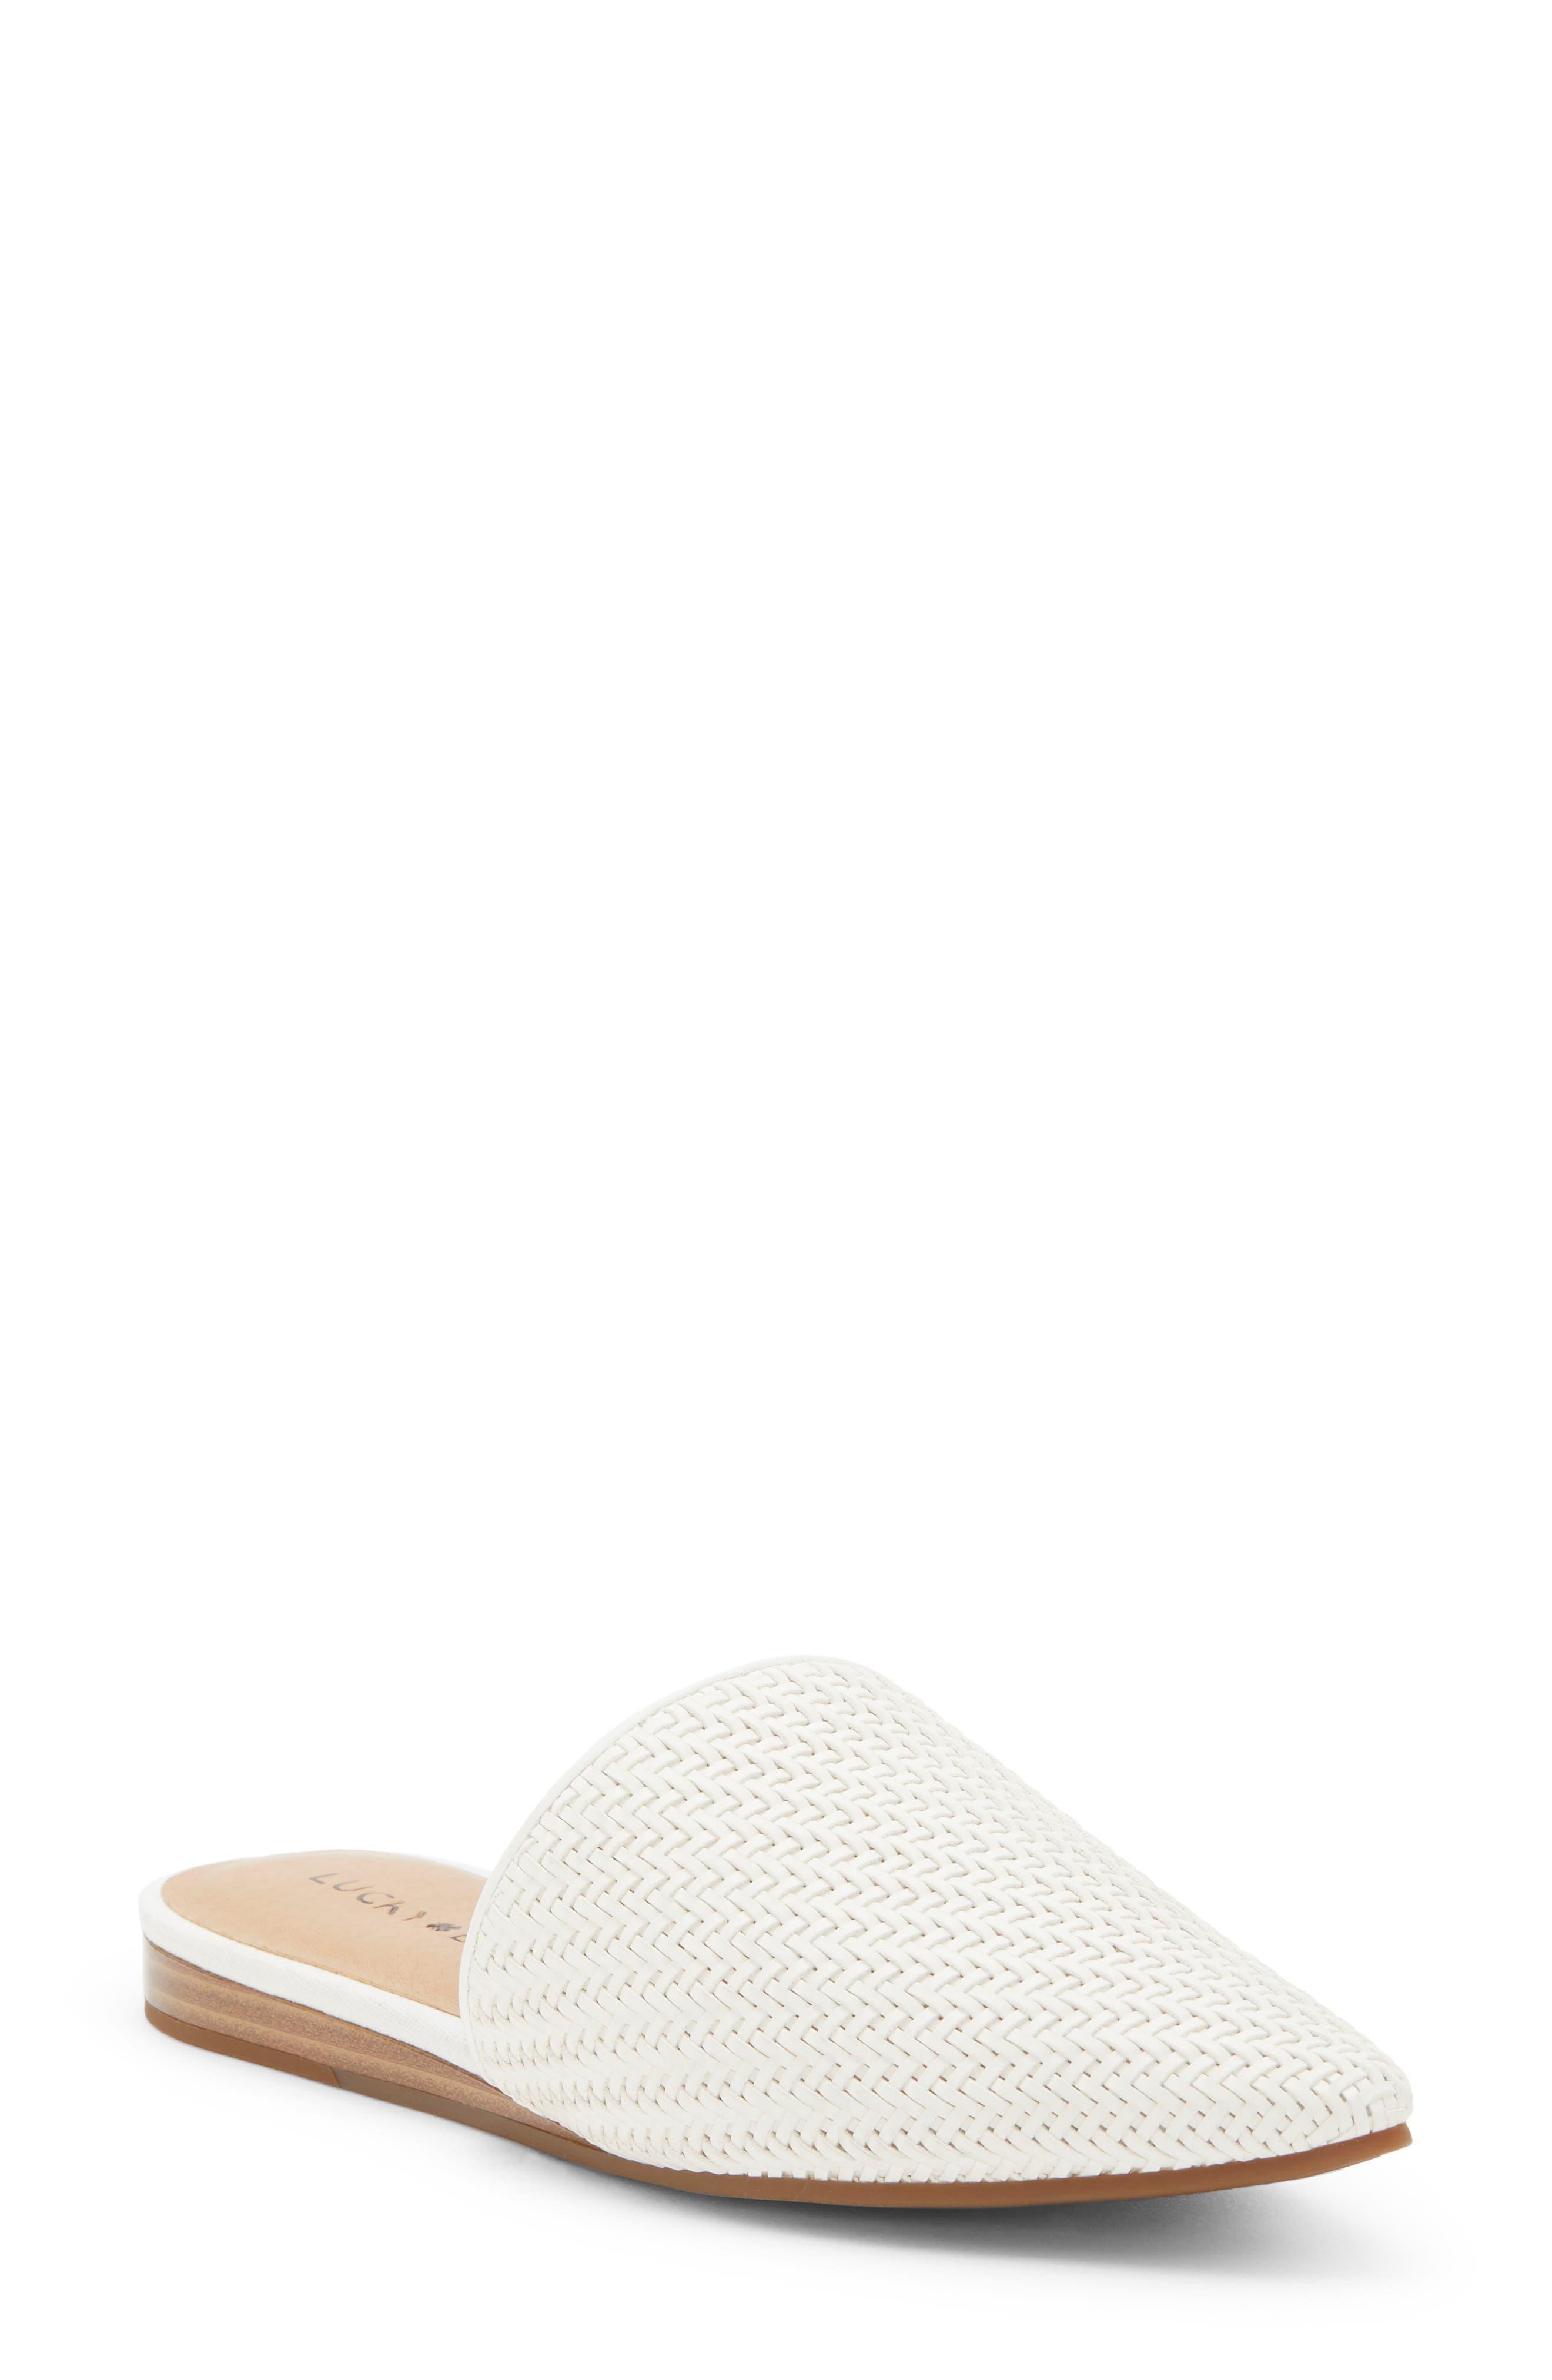 Lucky Brand Bradell Pointy Toe Mule- White